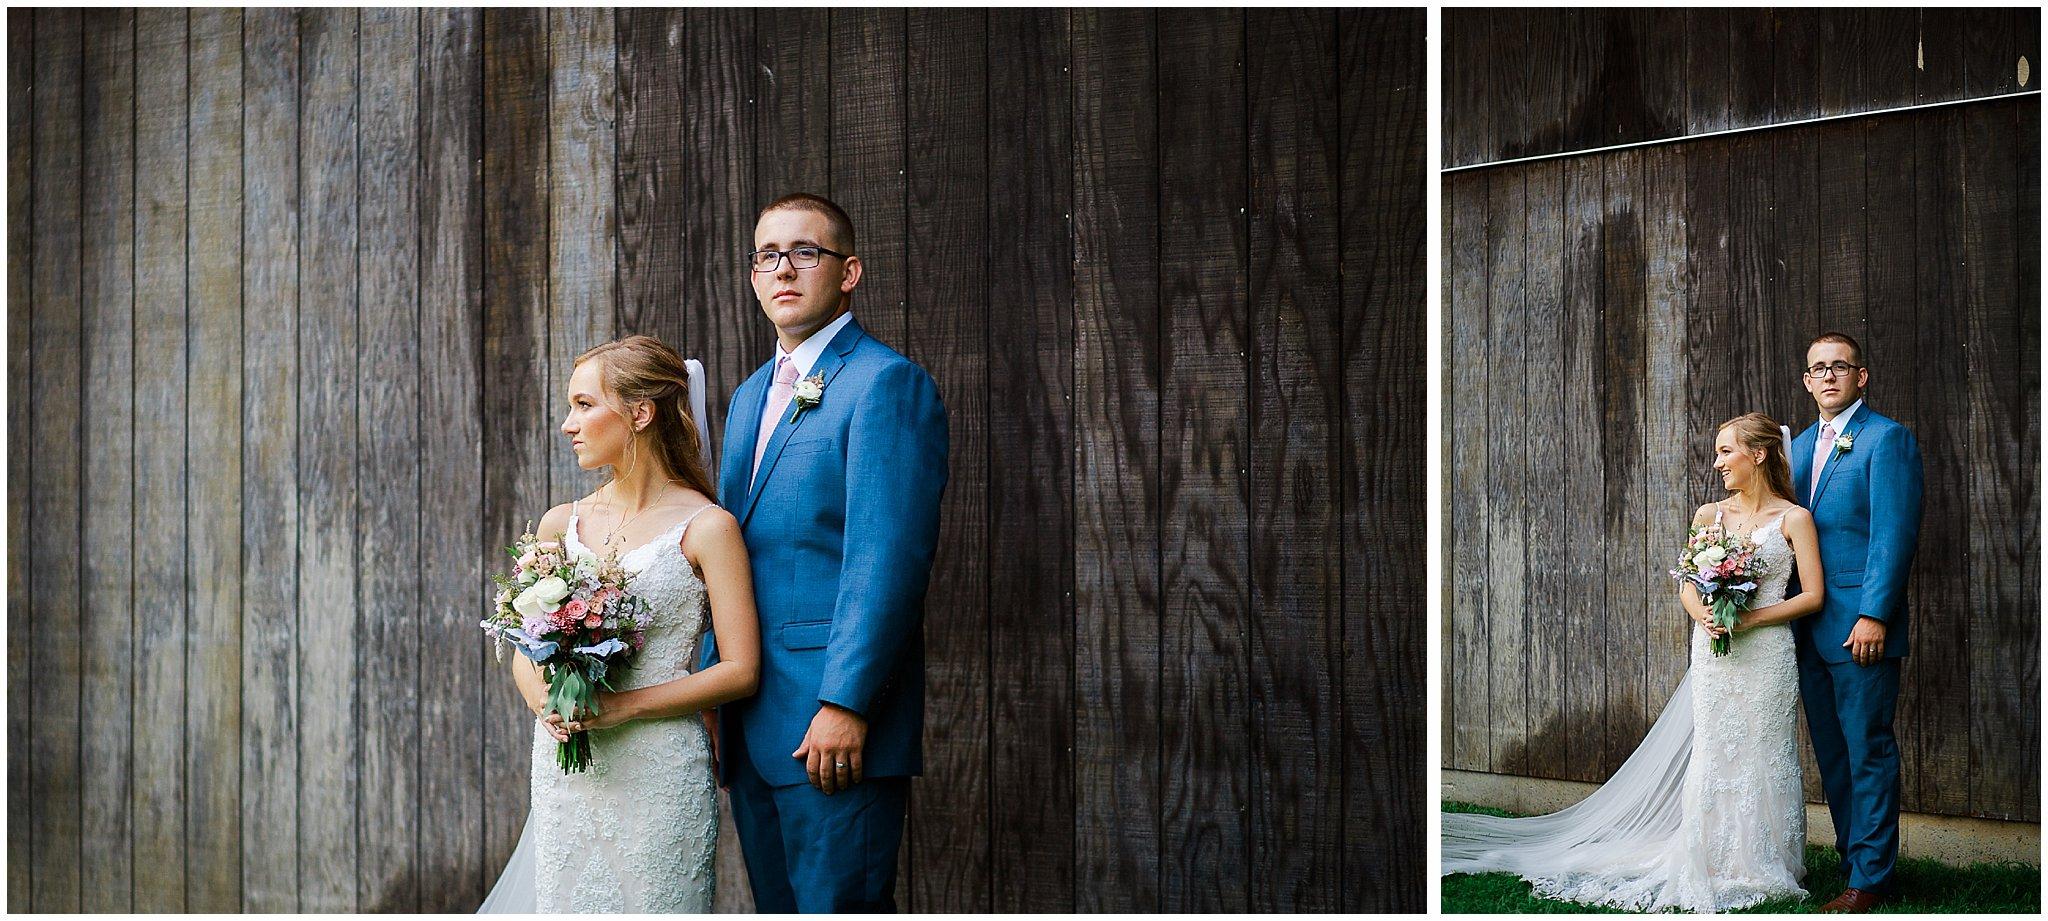 Preston Barn Old Drovers Inn Wedding Rustic Wedding Hudson Valley Photographer Sweet Alice Photography50.jpg